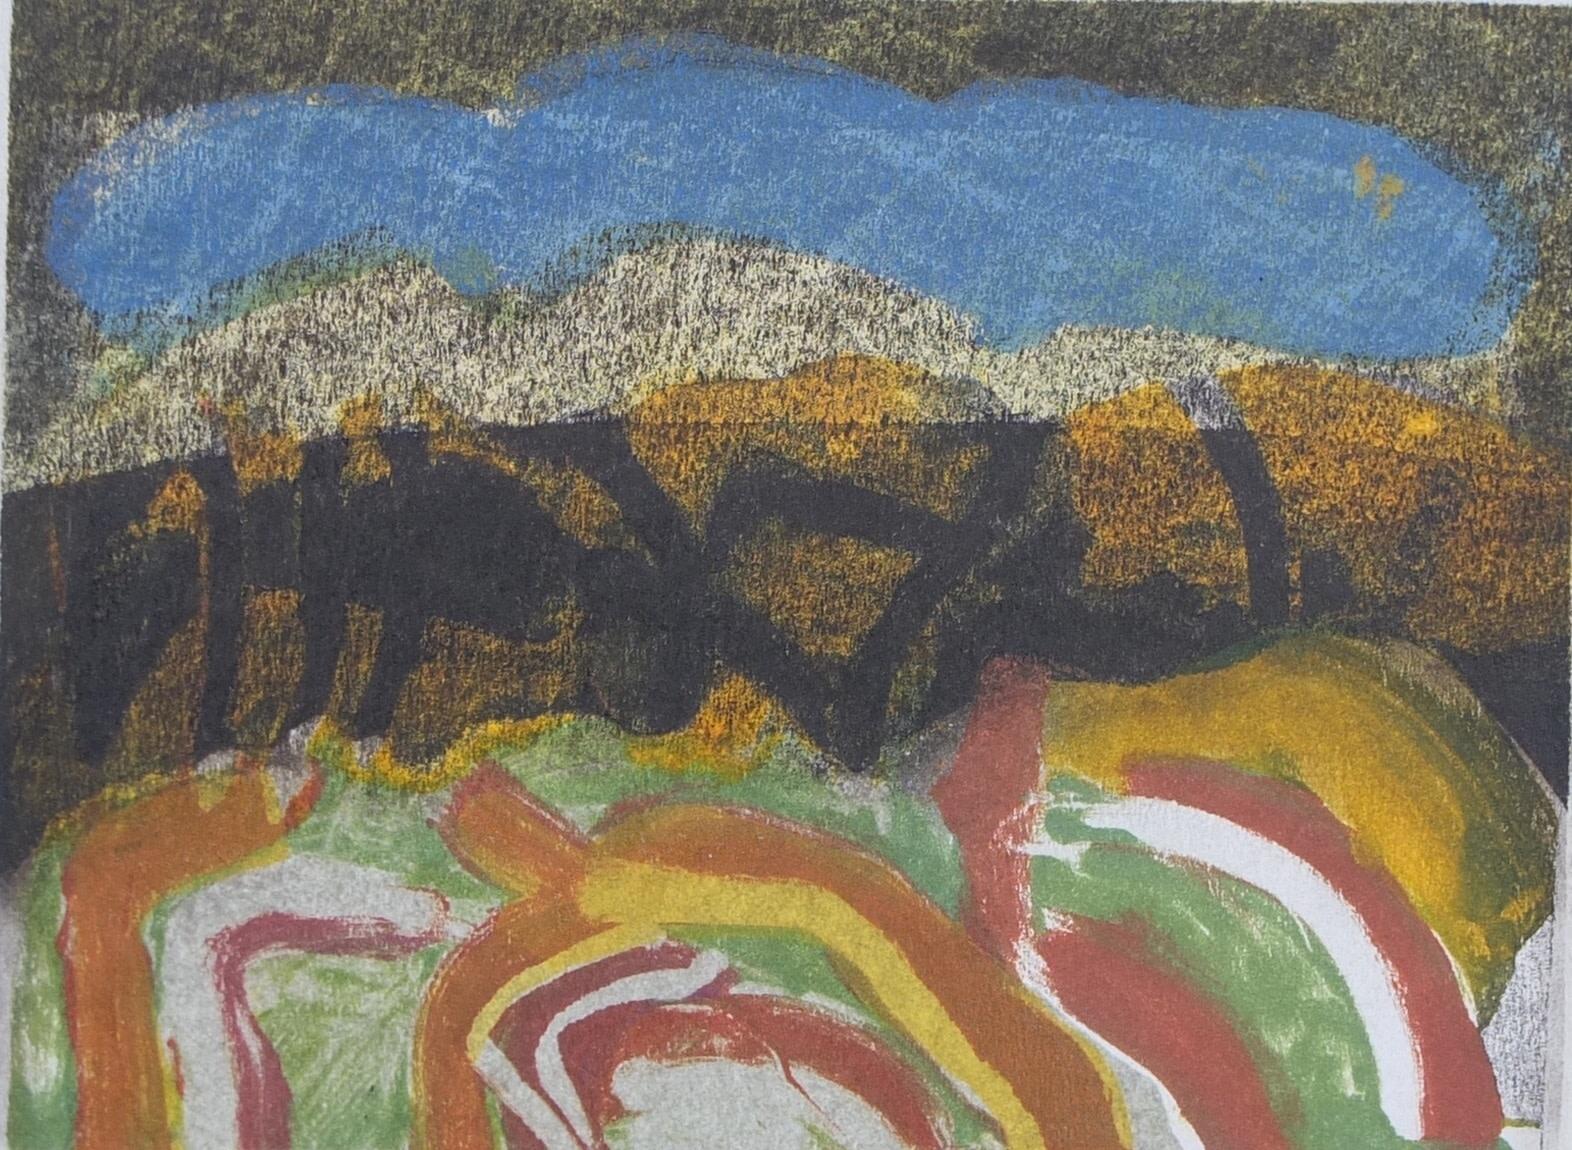 "<span class=""link fancybox-details-link""><a href=""/artists/32-robert-baggaley-re/works/10284/"">View Detail Page</a></span><div class=""artist""><span class=""artist""><strong>Robert Baggaley RE</strong></span></div><div class=""title""><em>View Through the Wood</em></div><div class=""medium"">monotype</div><div class=""dimensions"">34 x 32cm framed size</div><div class=""price"">£210.00</div>"